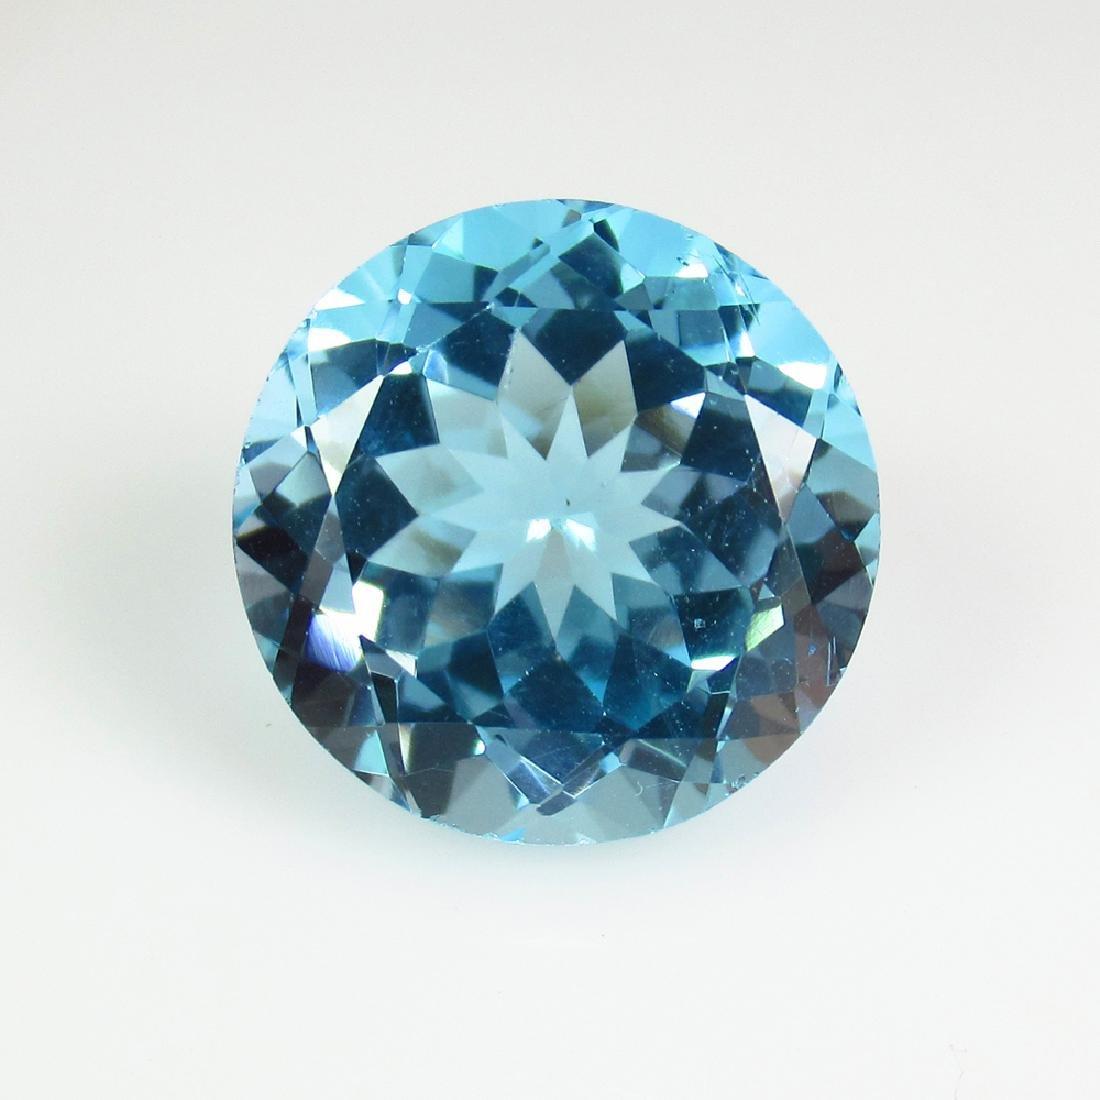 12.95 Ct Genuine Brazil Blue Topaz 14 mm Round Cut